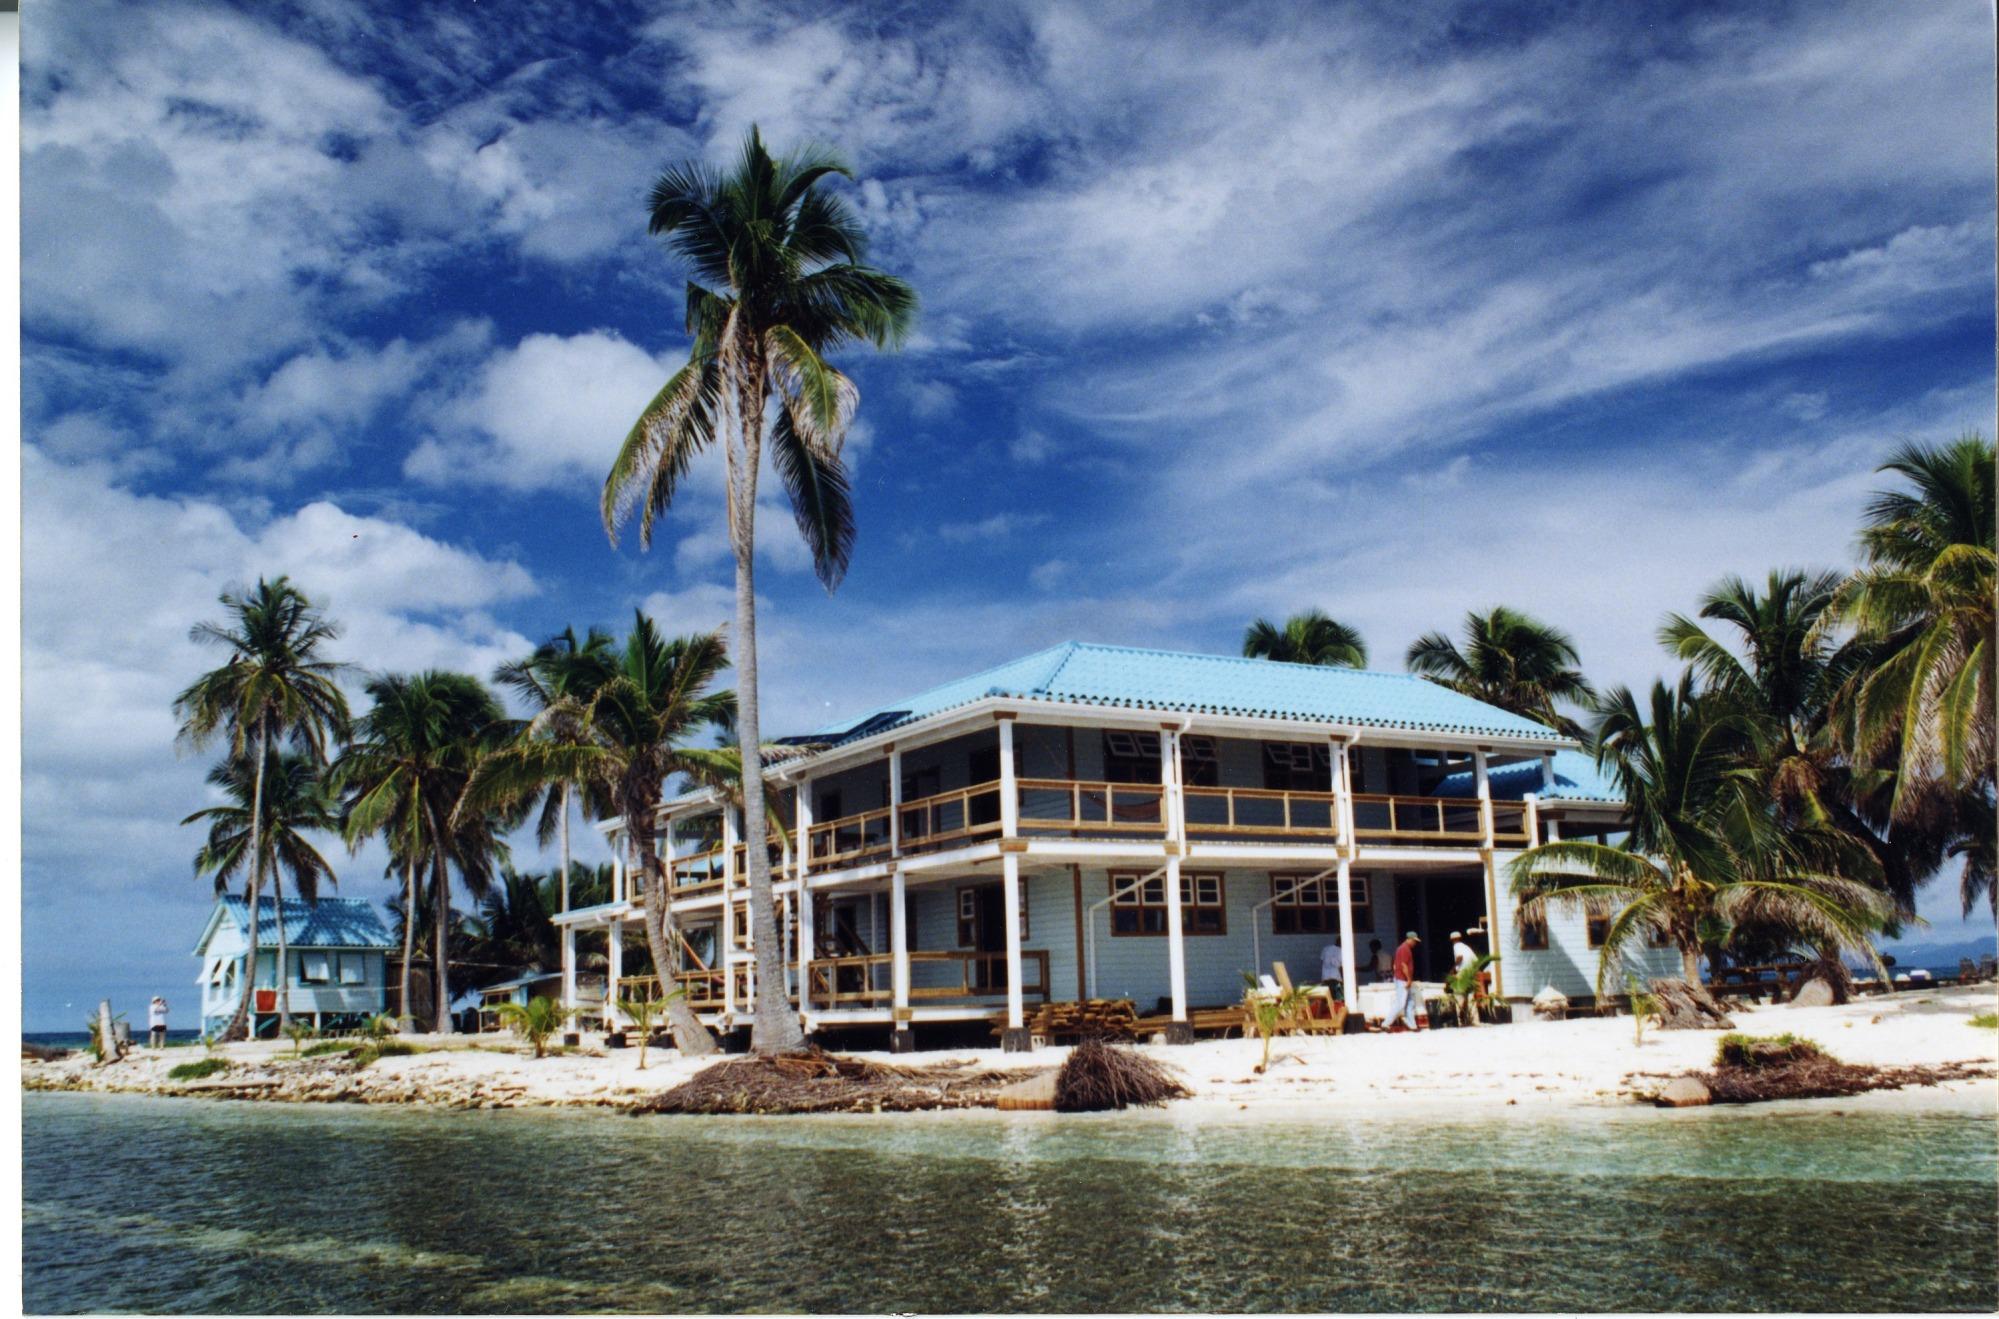 Belize Marine Field Station